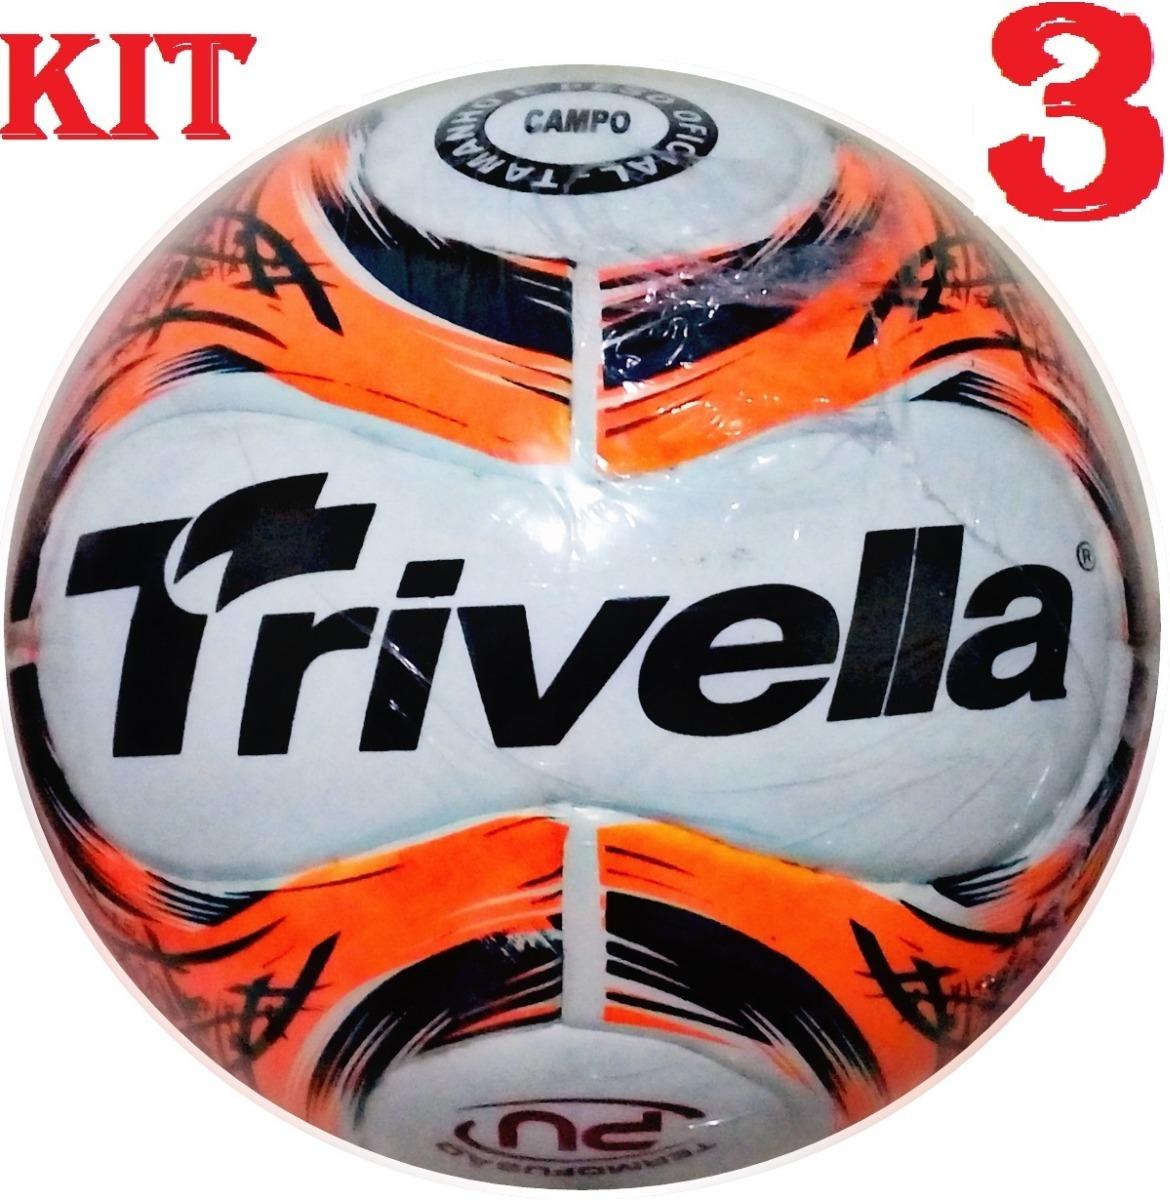 c60026df29 kit 3 bolas futebol campo trivella original - brasil gold. Carregando zoom.